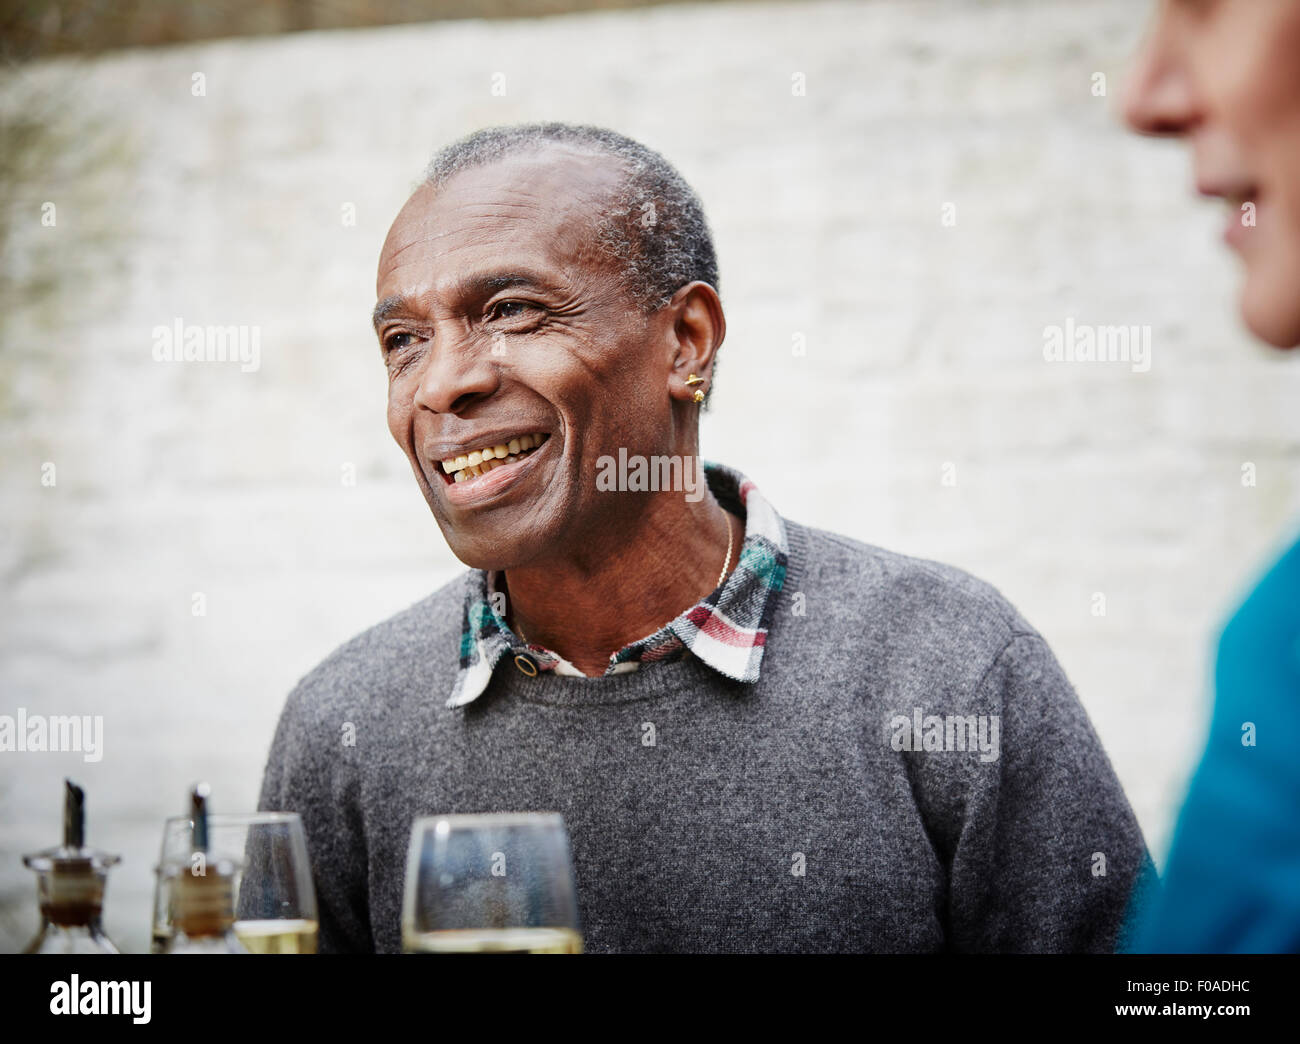 Senior man smiling, portrait - Stock Image